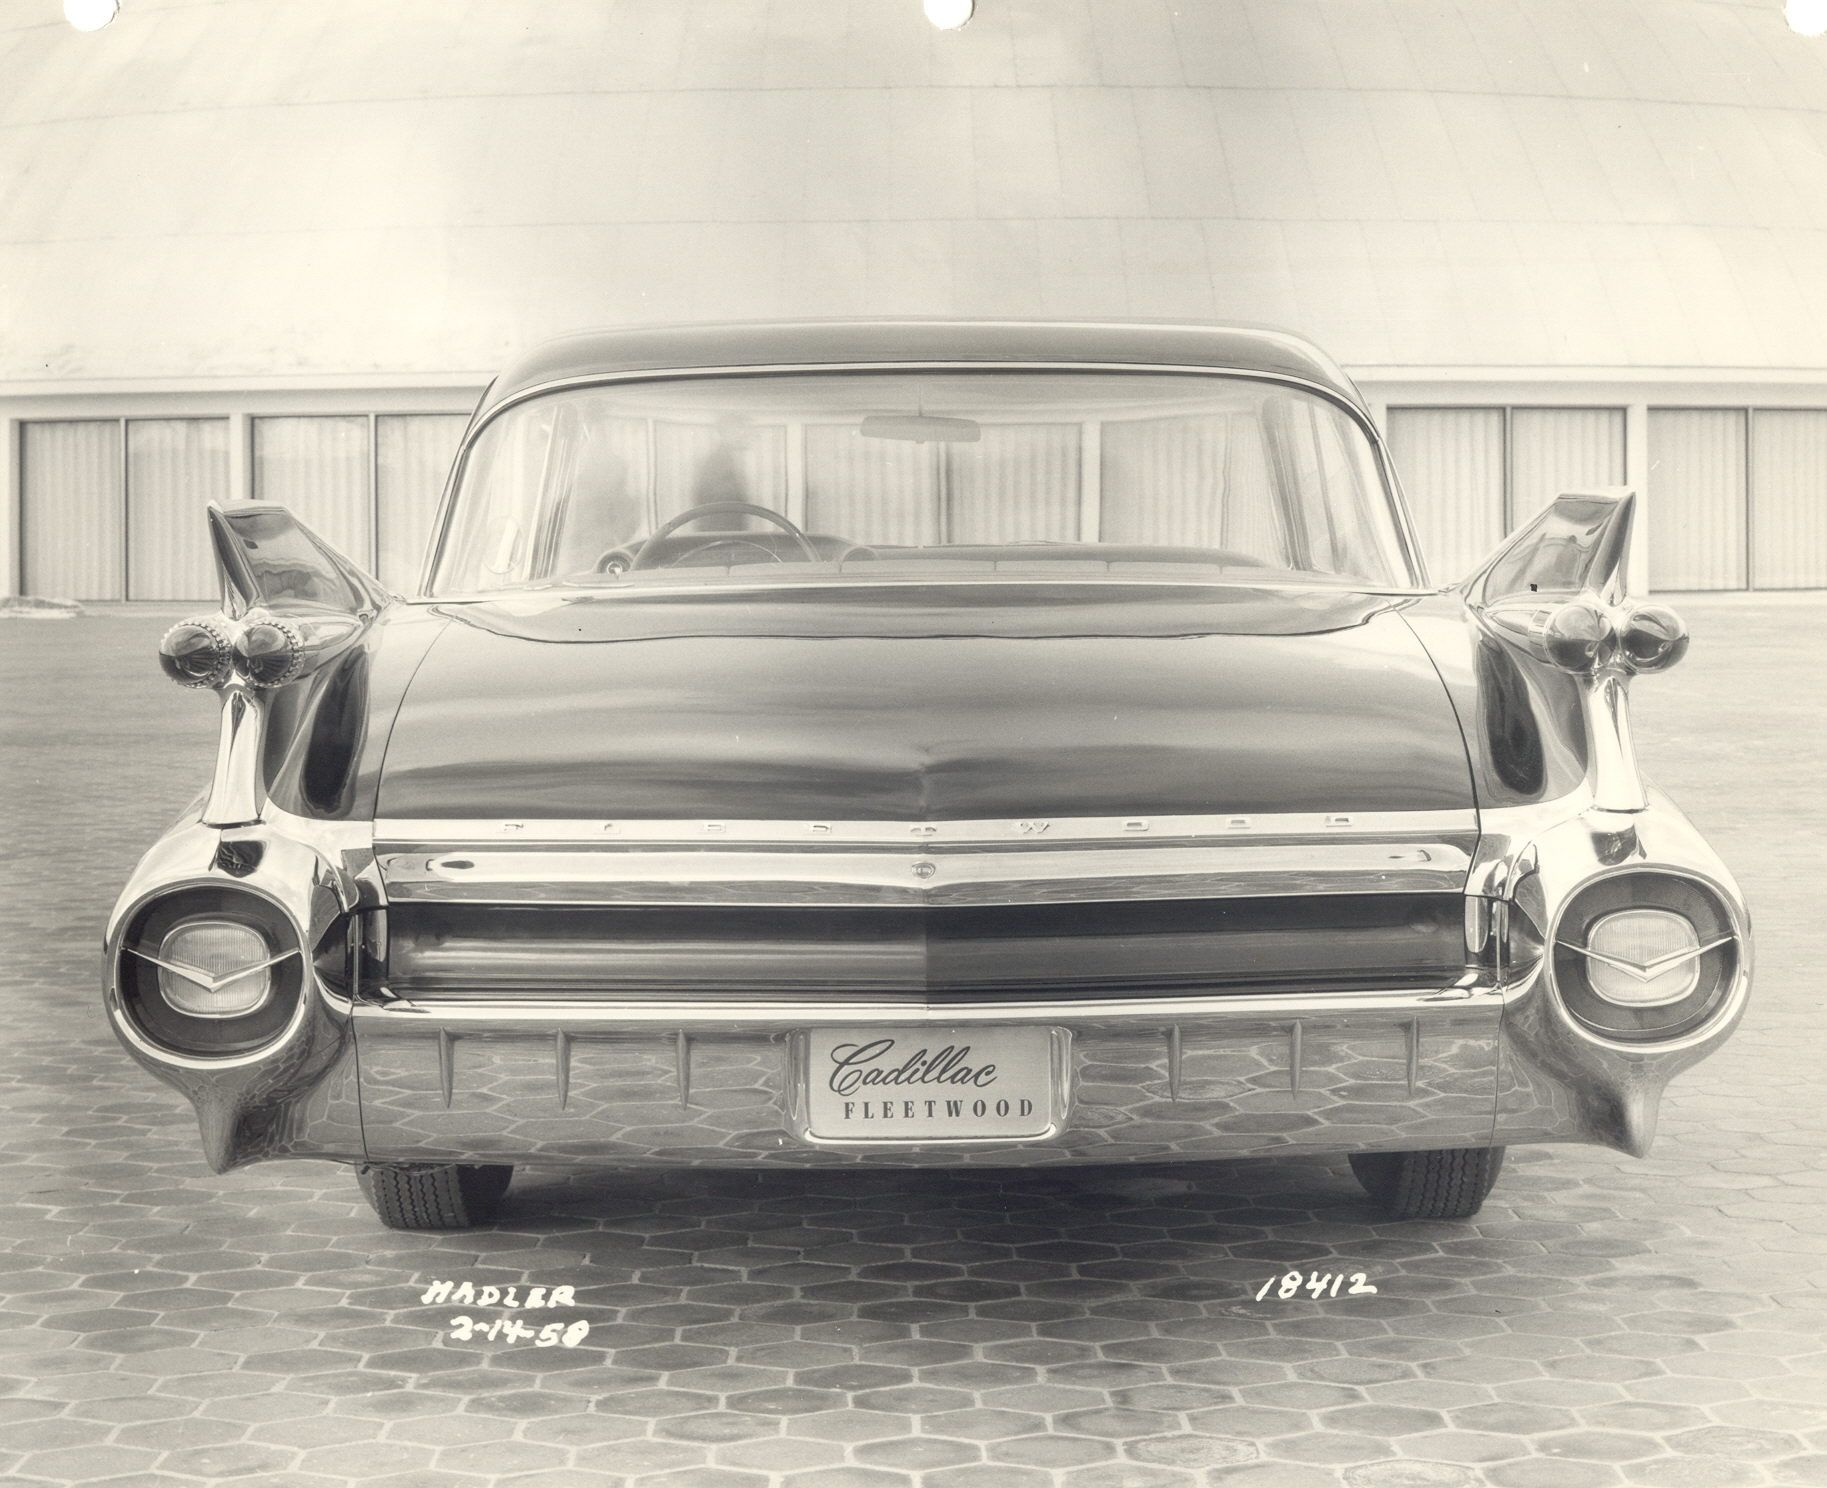 Cadillac Fleetwood 60, 1958 -  Full-size prototype